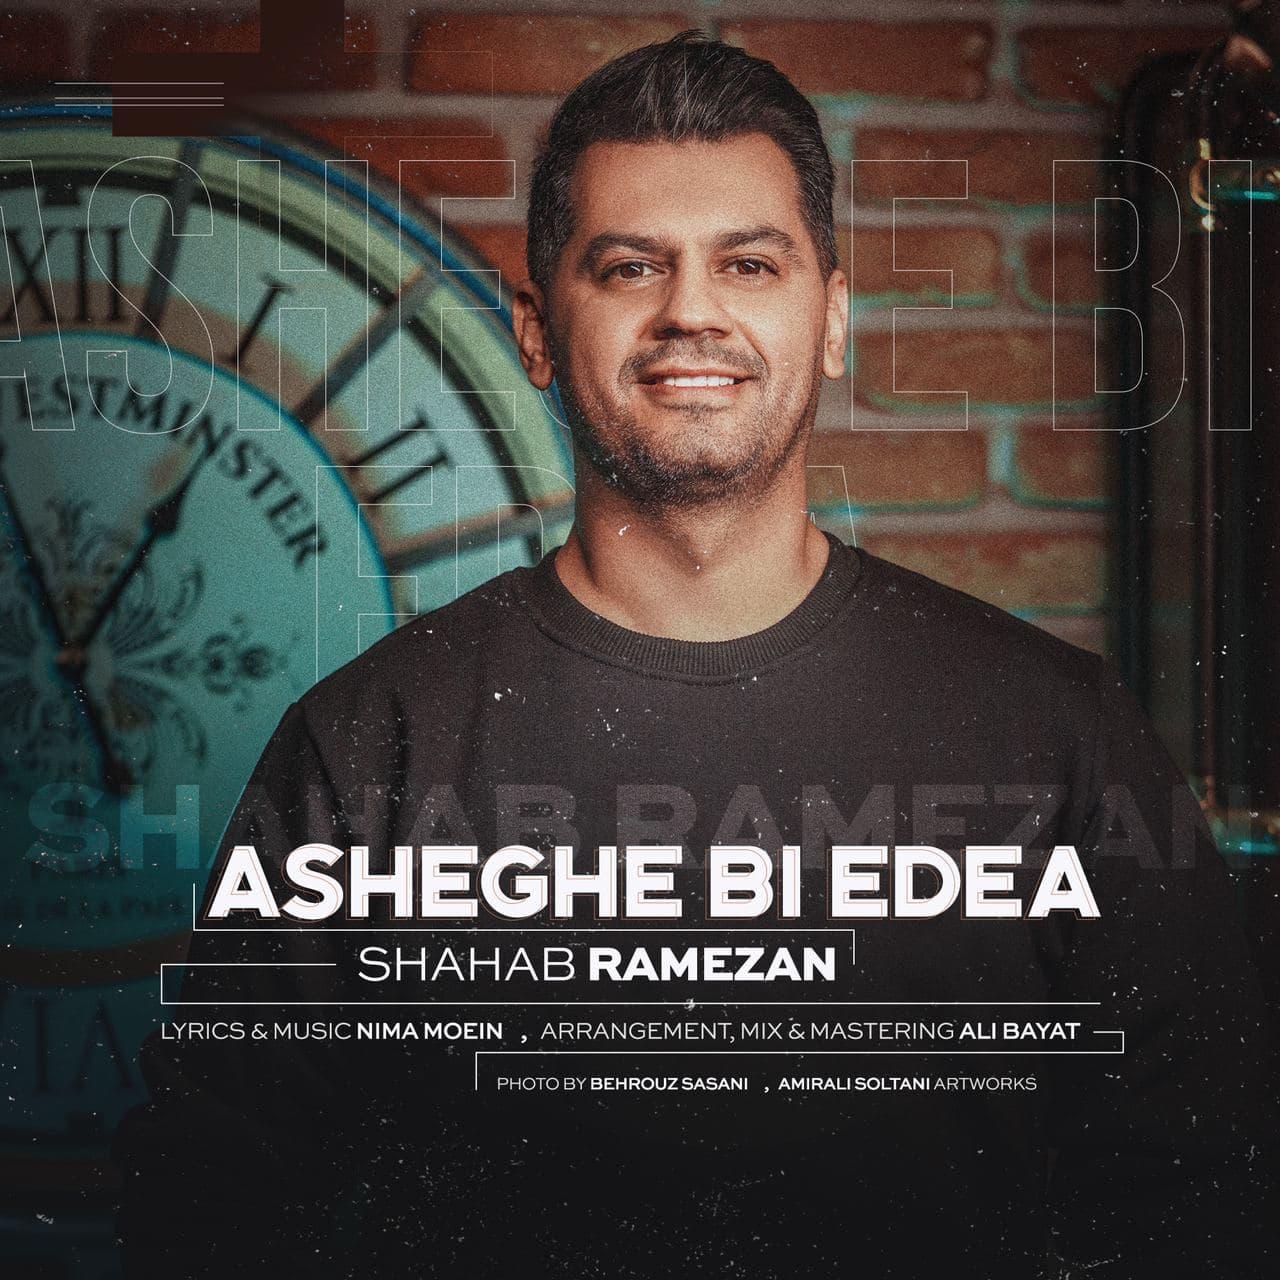 Shahab Ramezan – Asheghe Bi Edea